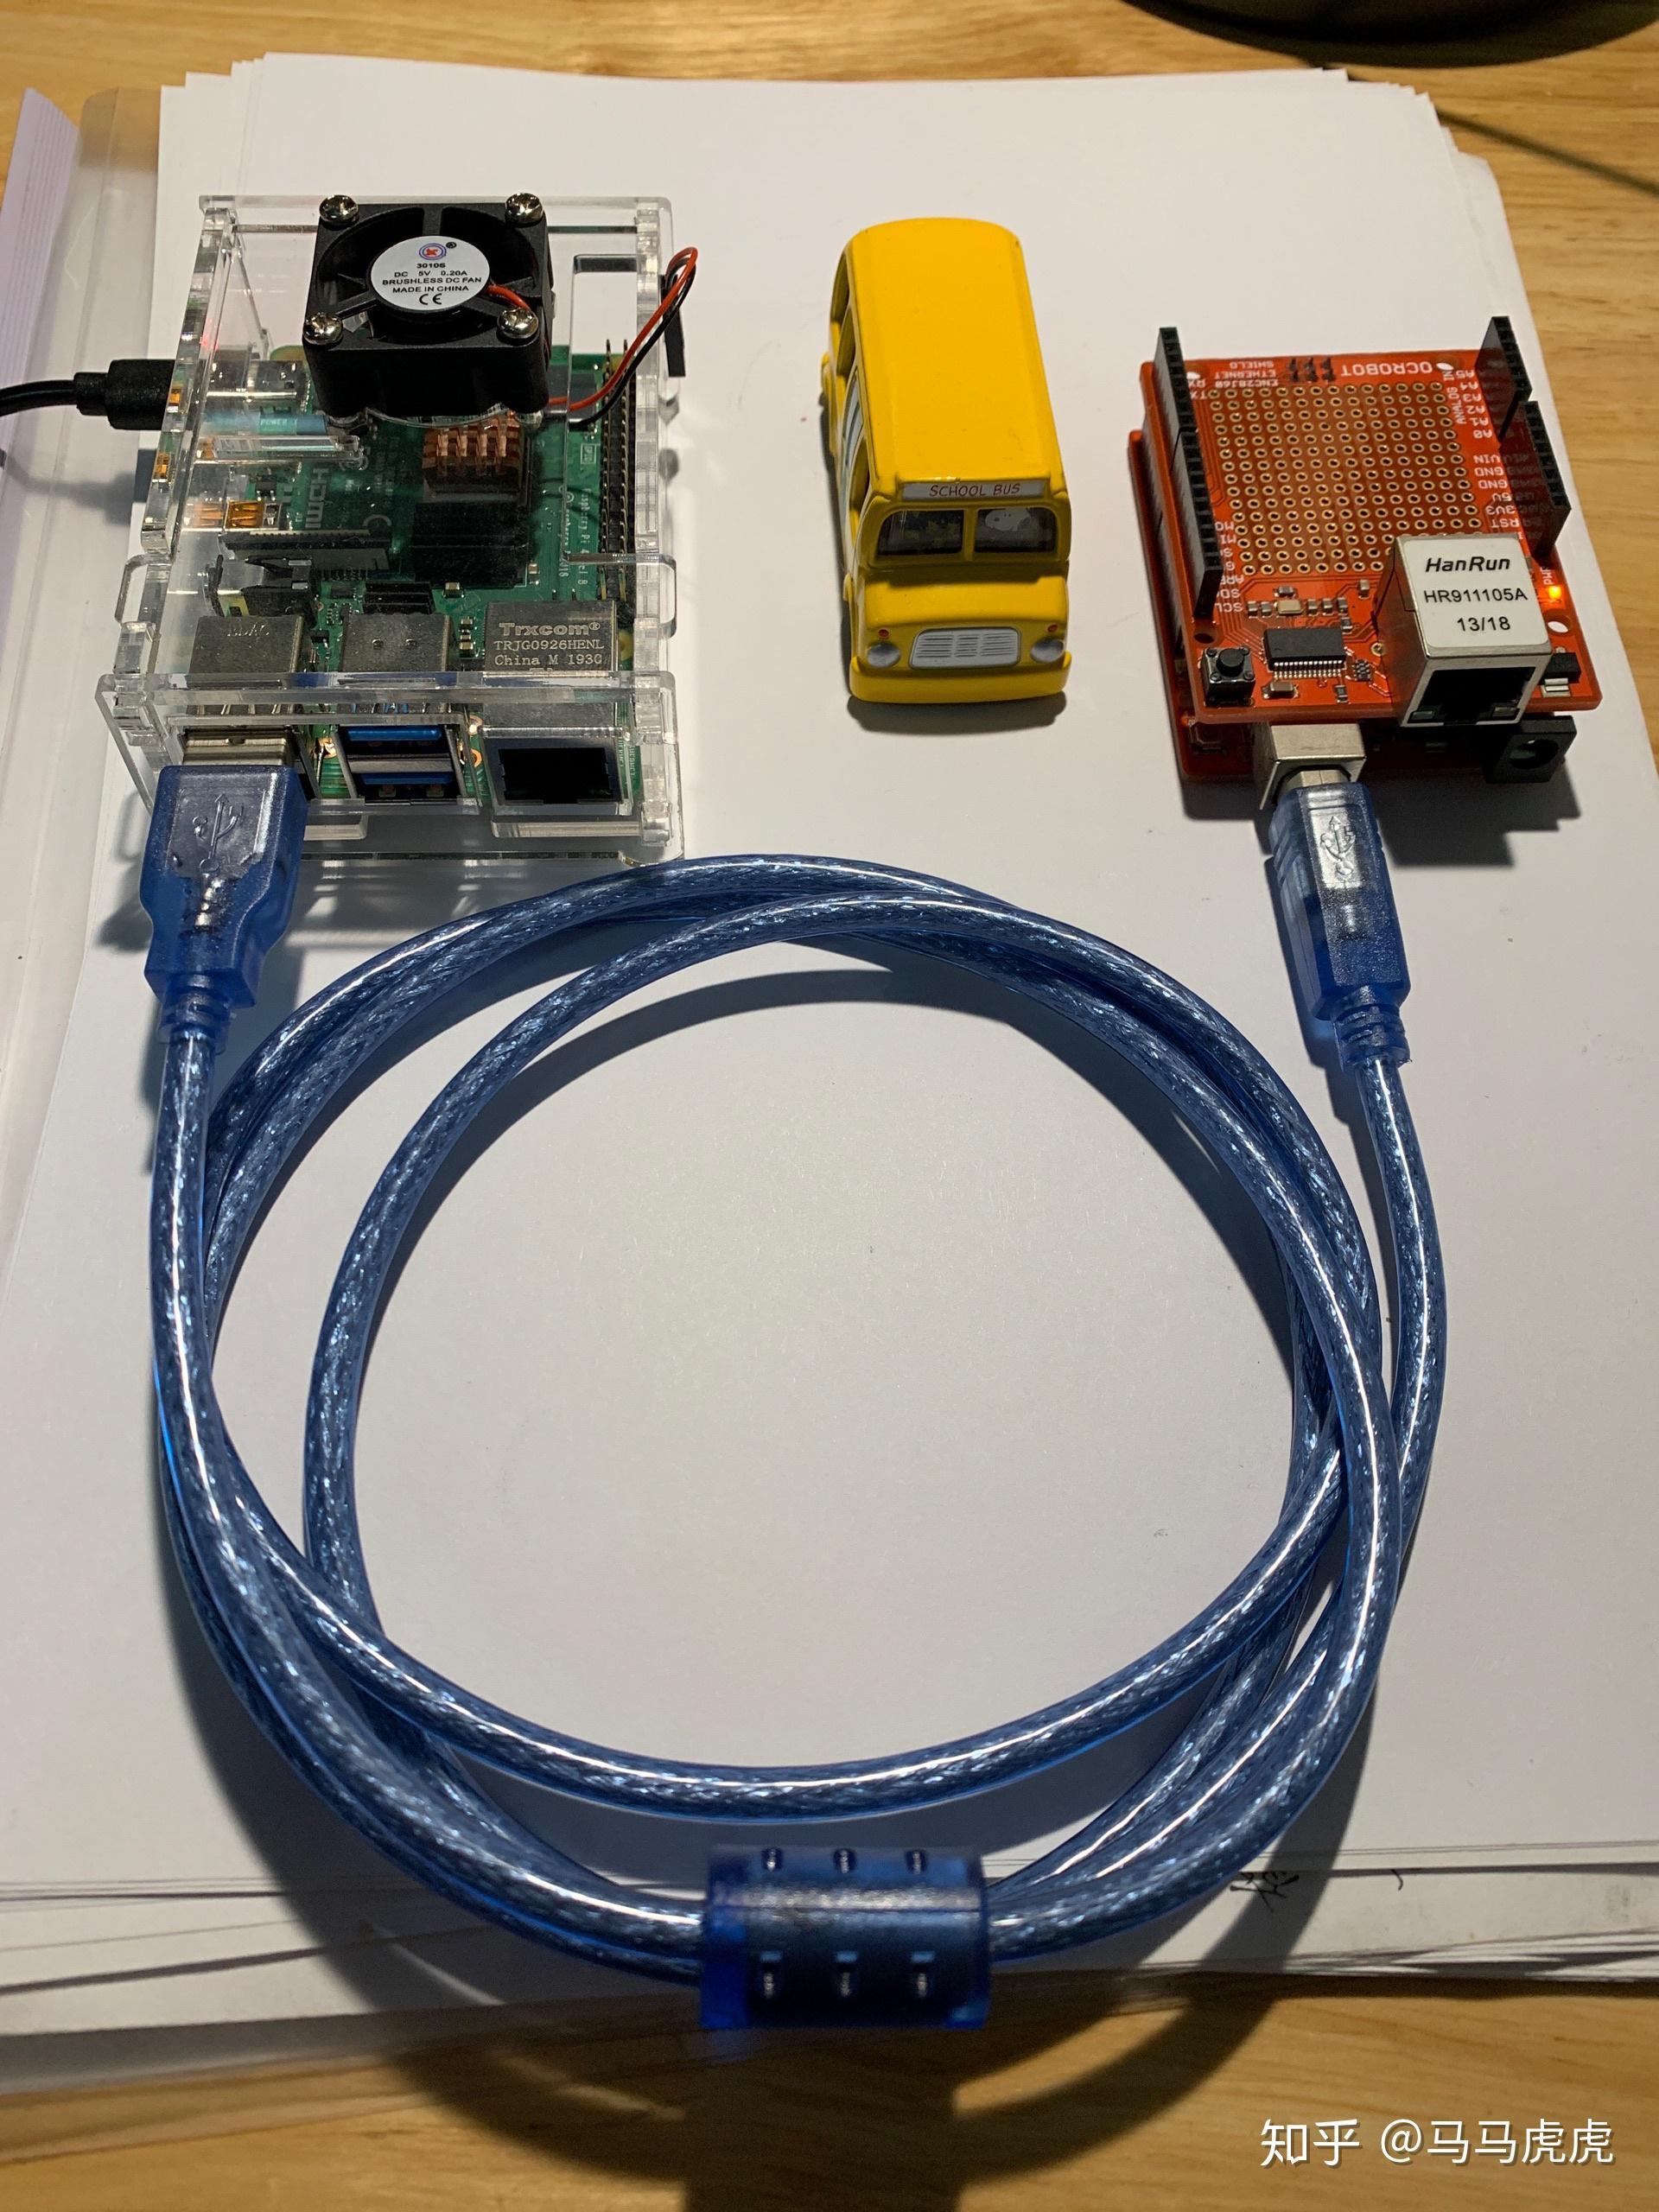 rs232转usb驱动_树莓派4B入坑指南 part-2 Serial Port, COM, RS232, USB解释与实践 - 知乎